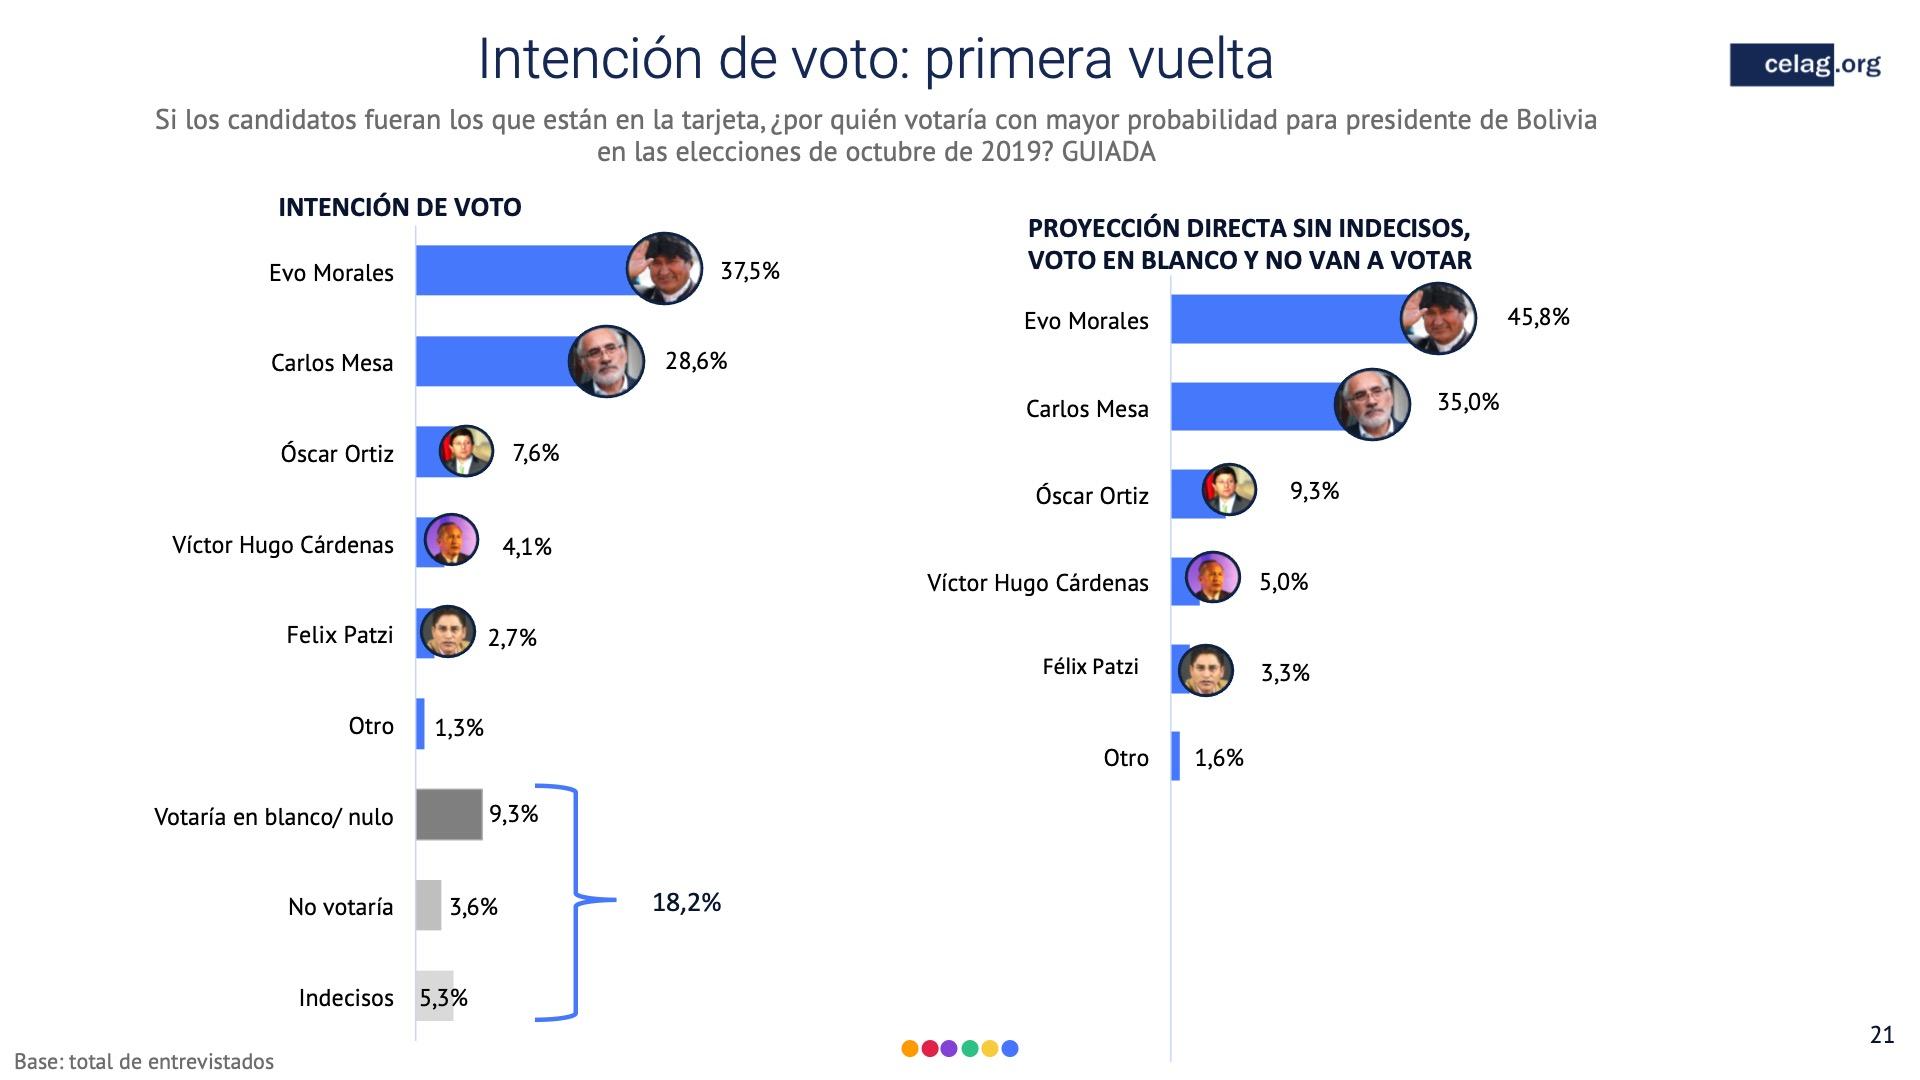 21 Elecciones bolivia intencion voto primera vuelta